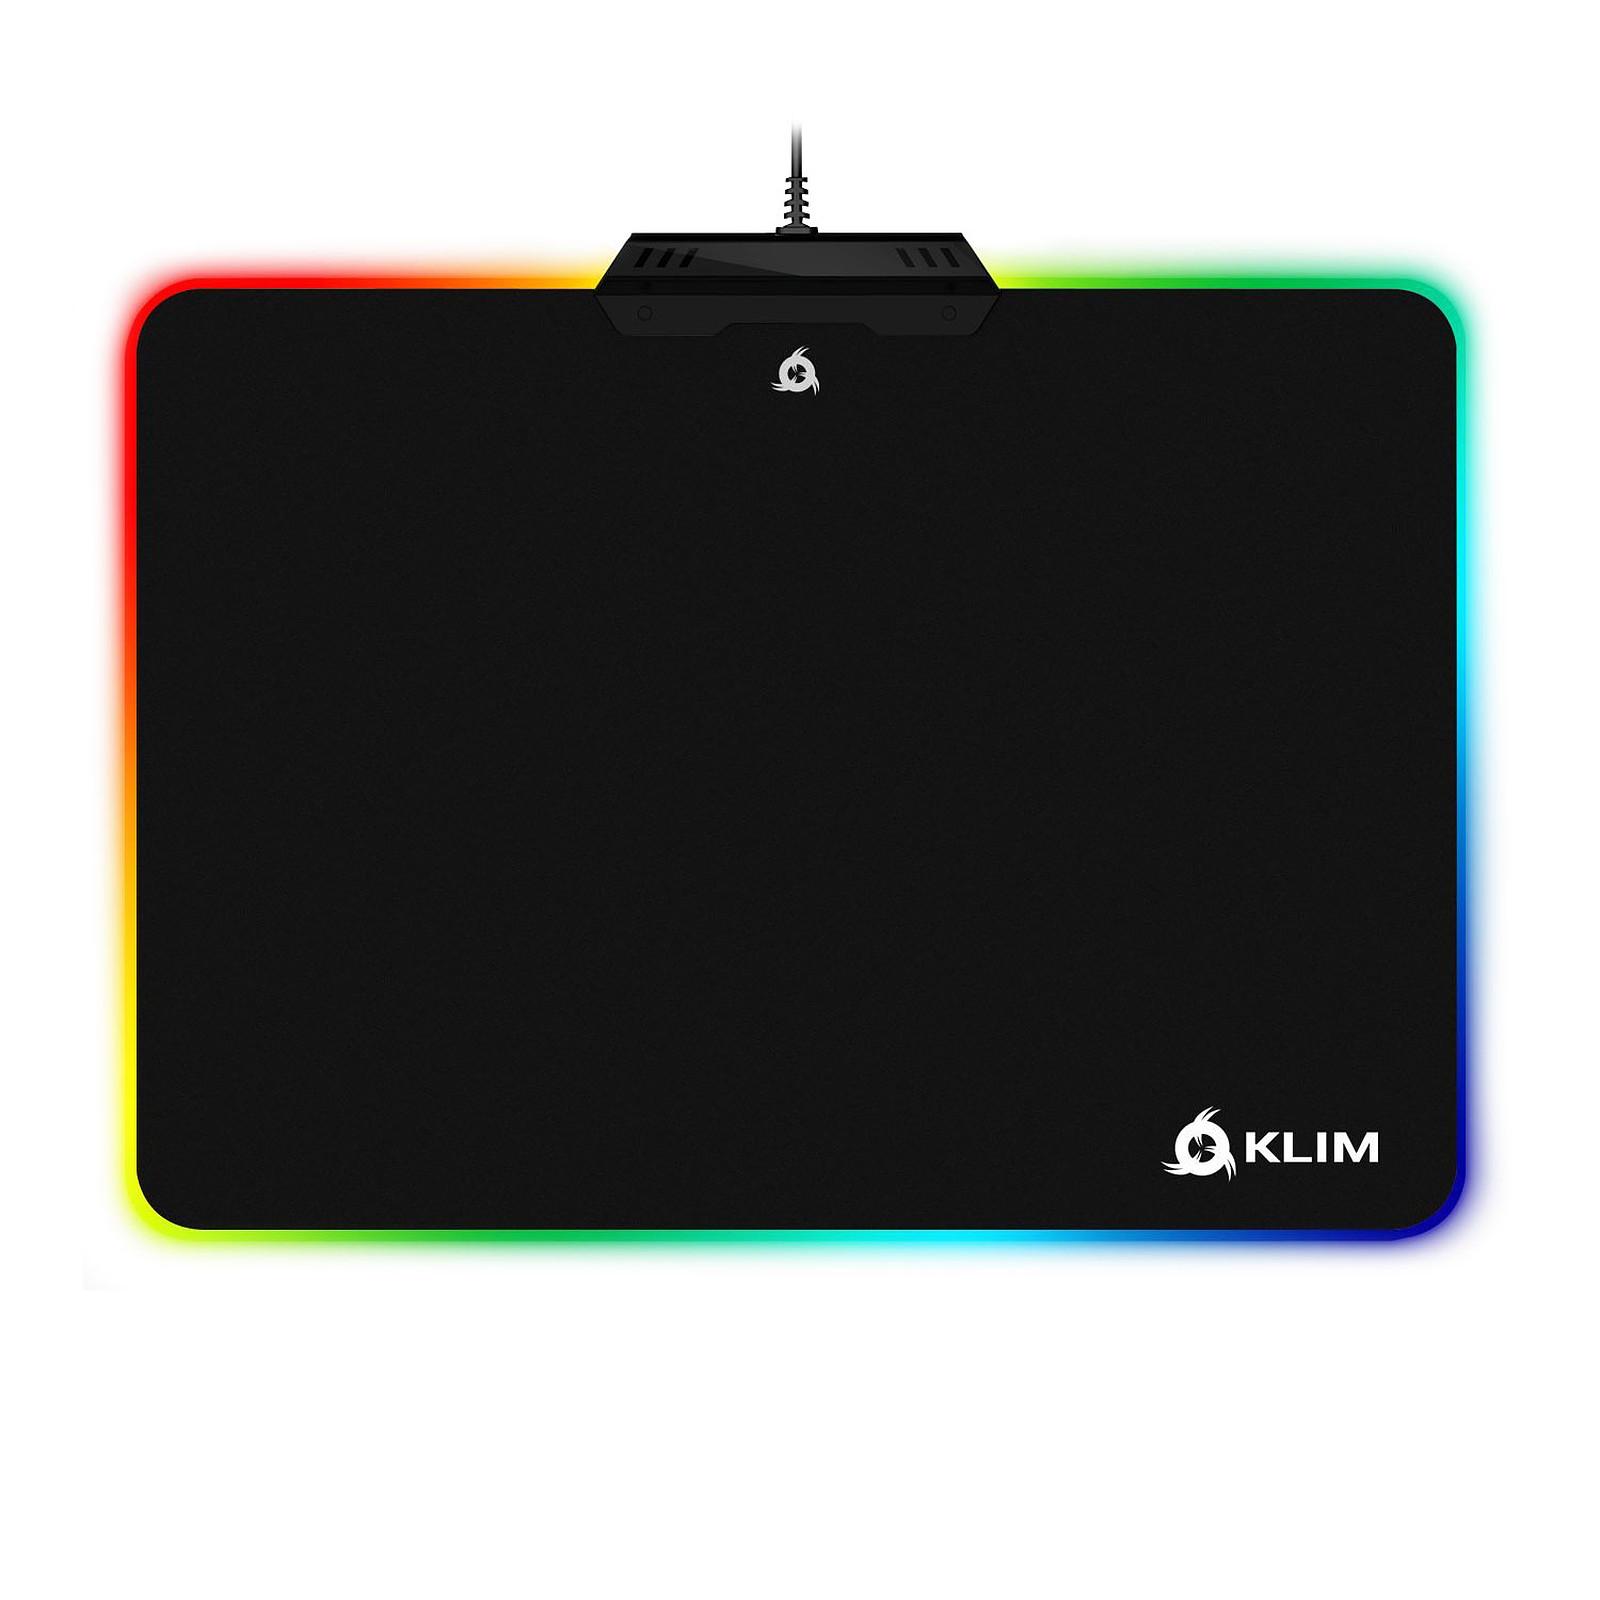 KLIM RGB Mousepad